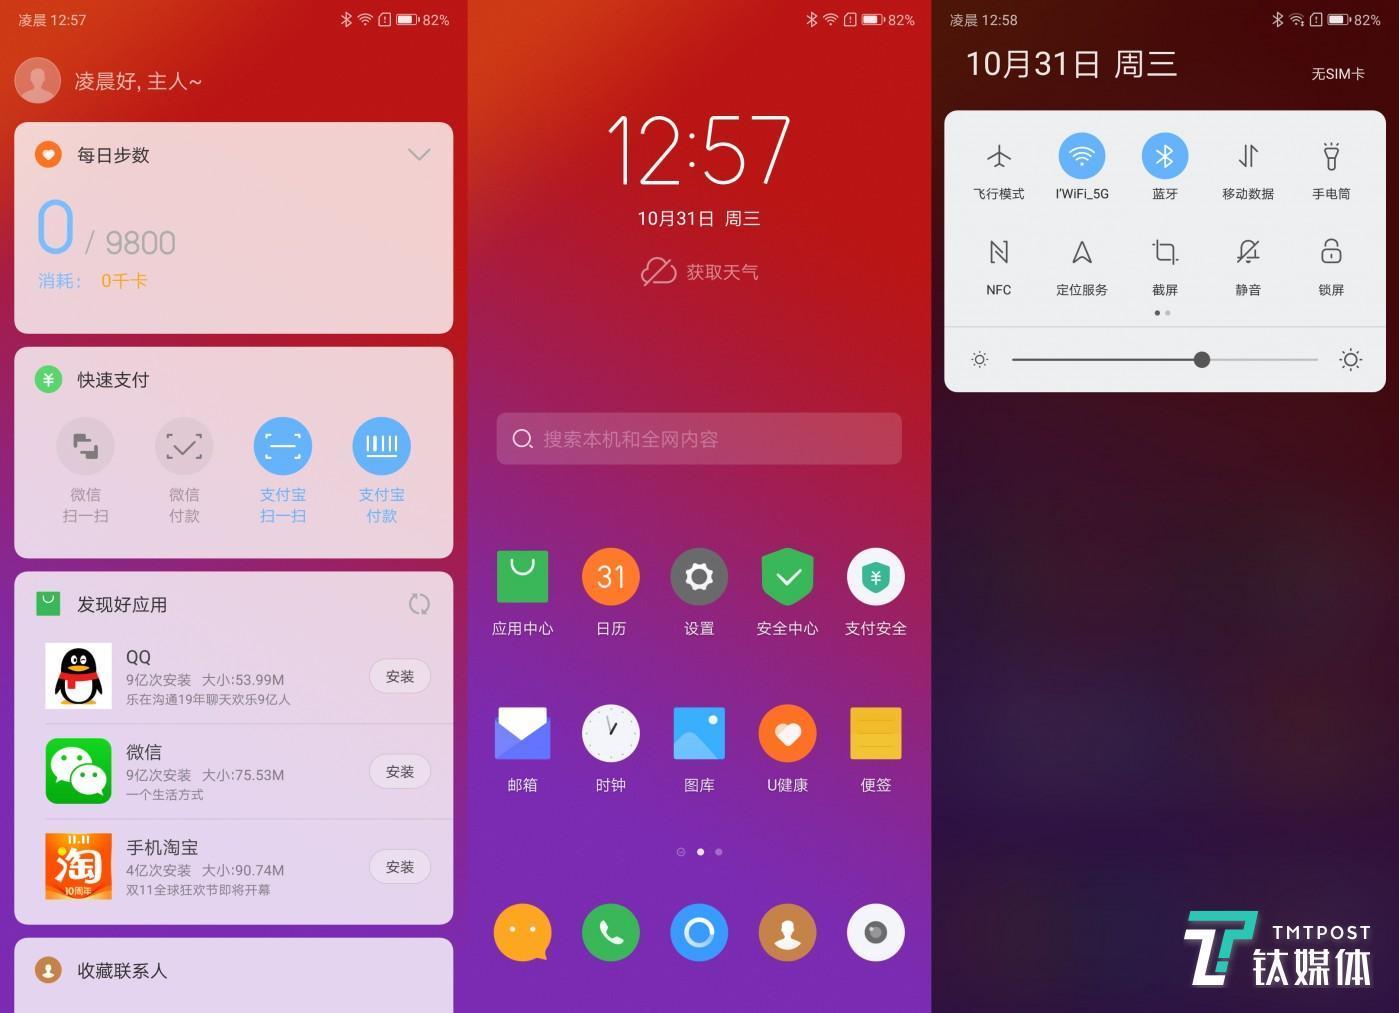 ZUI 10.0系统(基于Android 8.1)